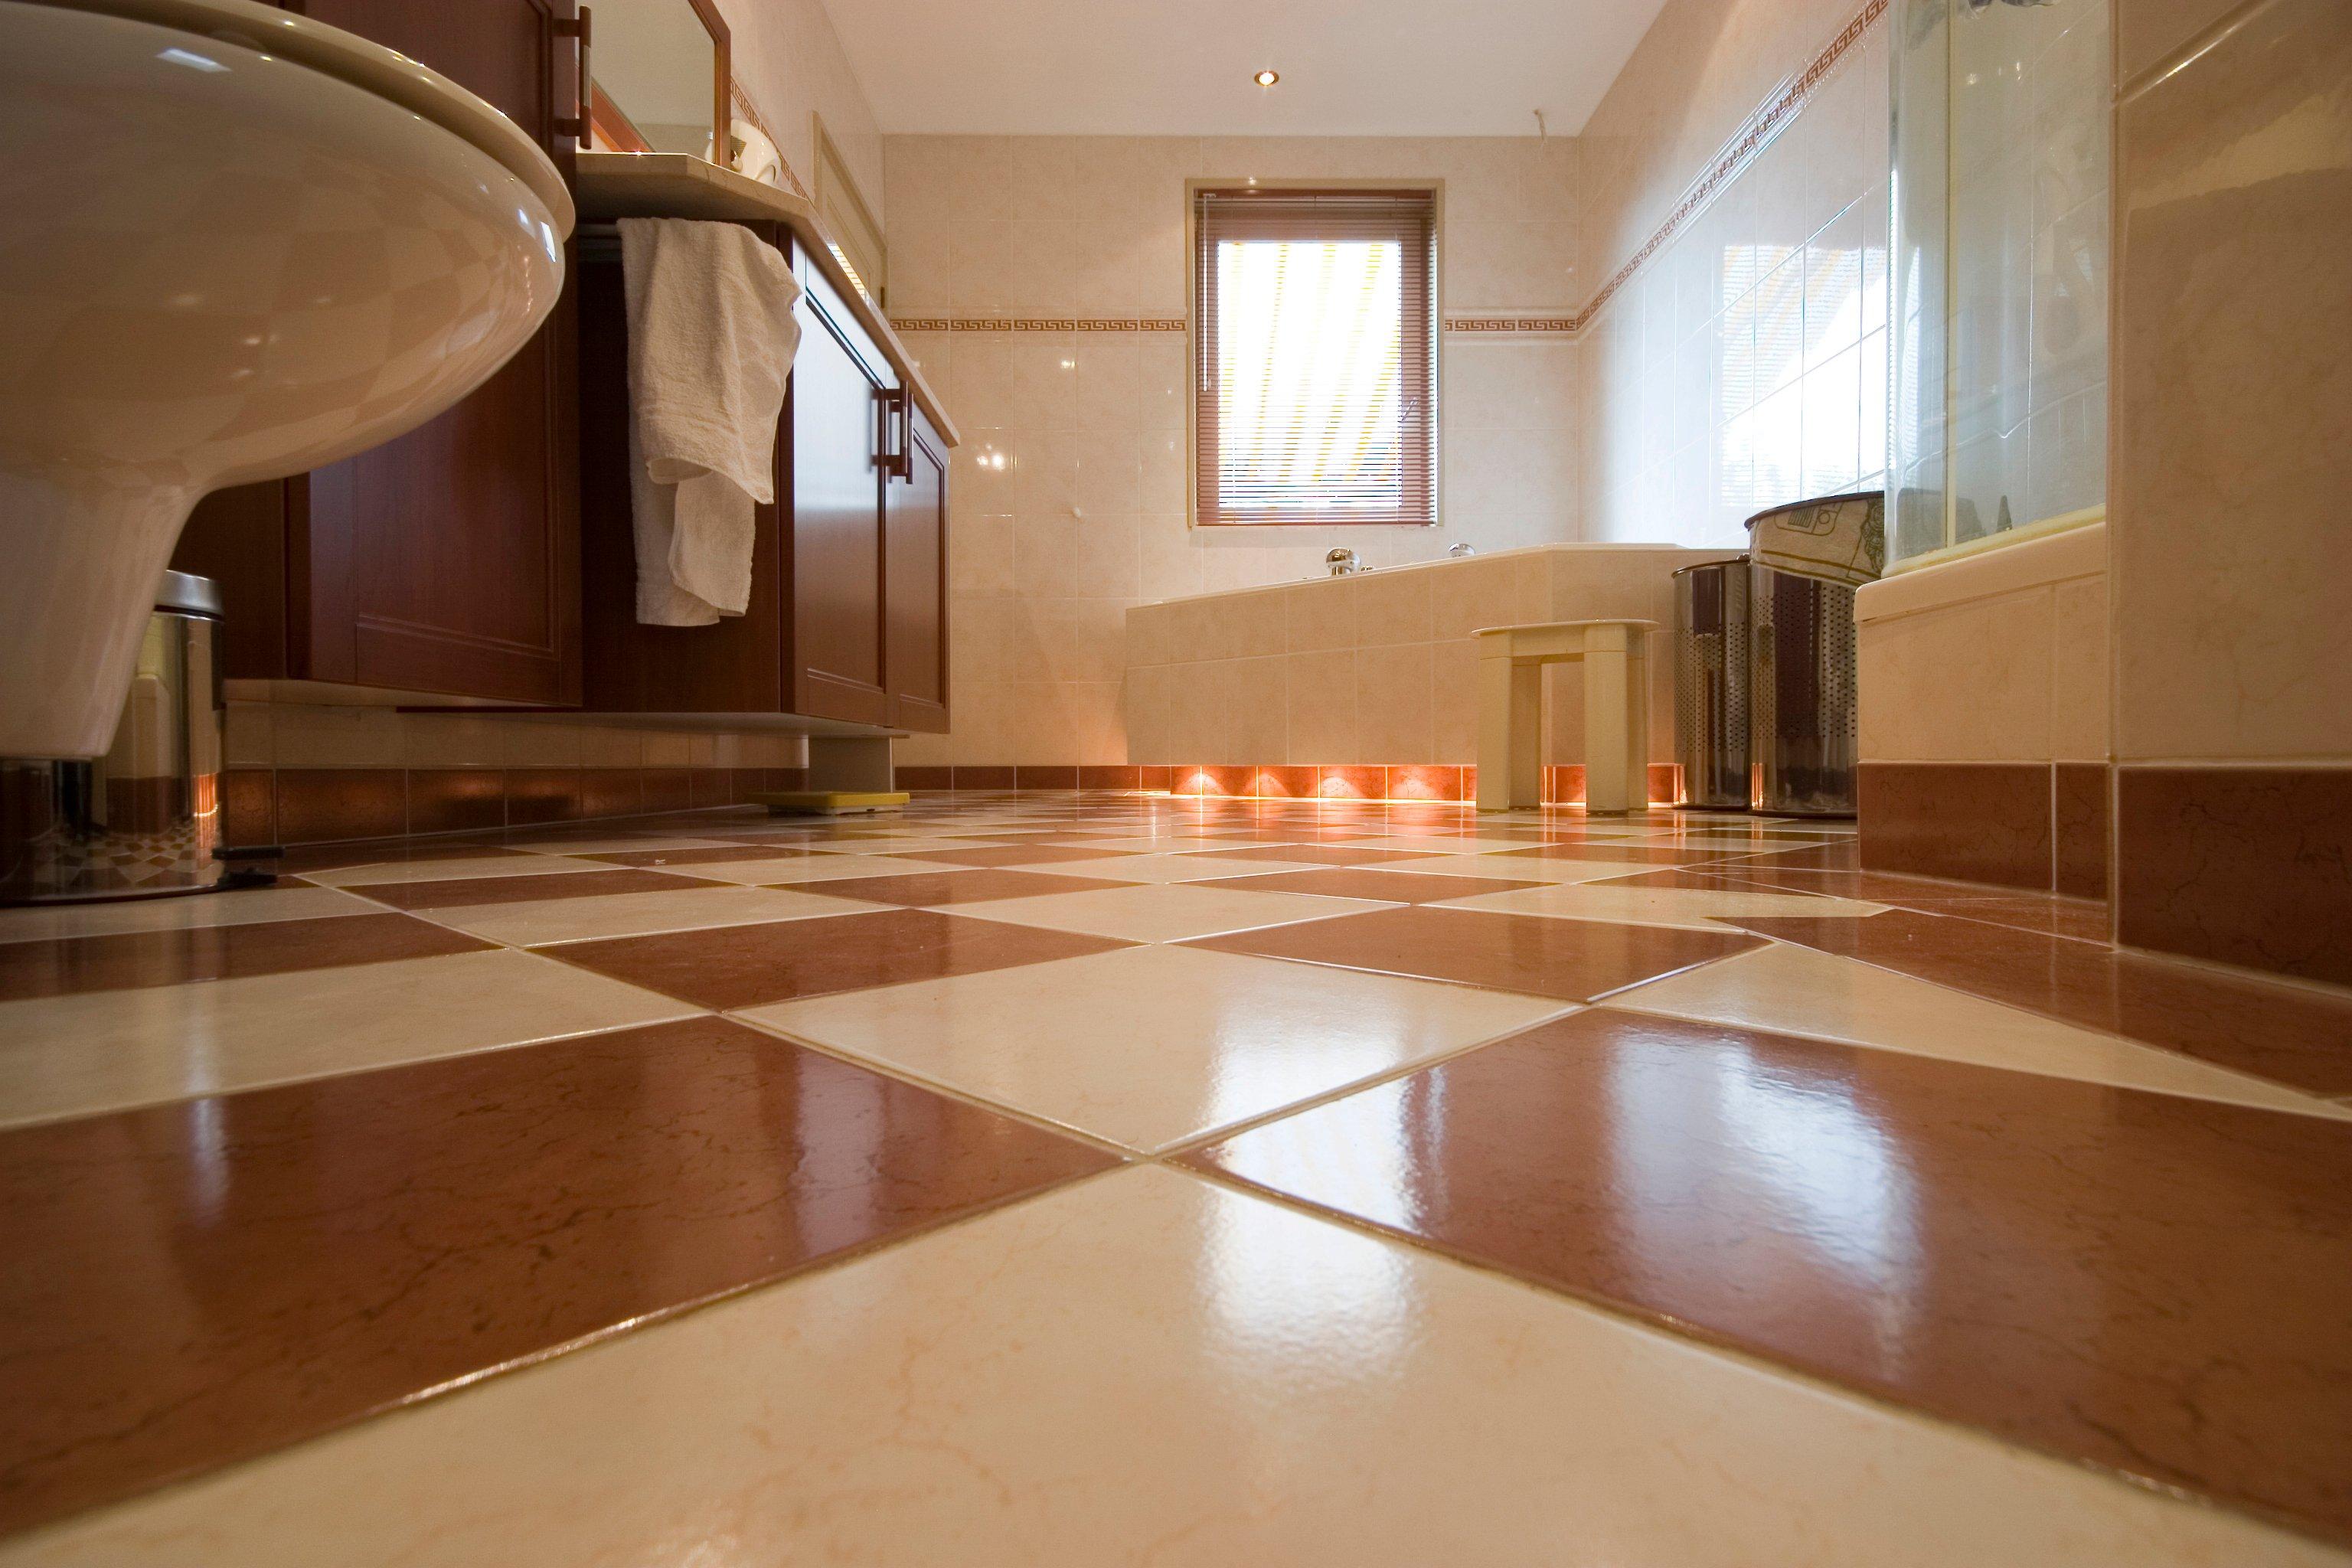 clean tile floor treatment for bathroom floor | The Most Effective Way to Clean Tile Floors | WarmlyYours